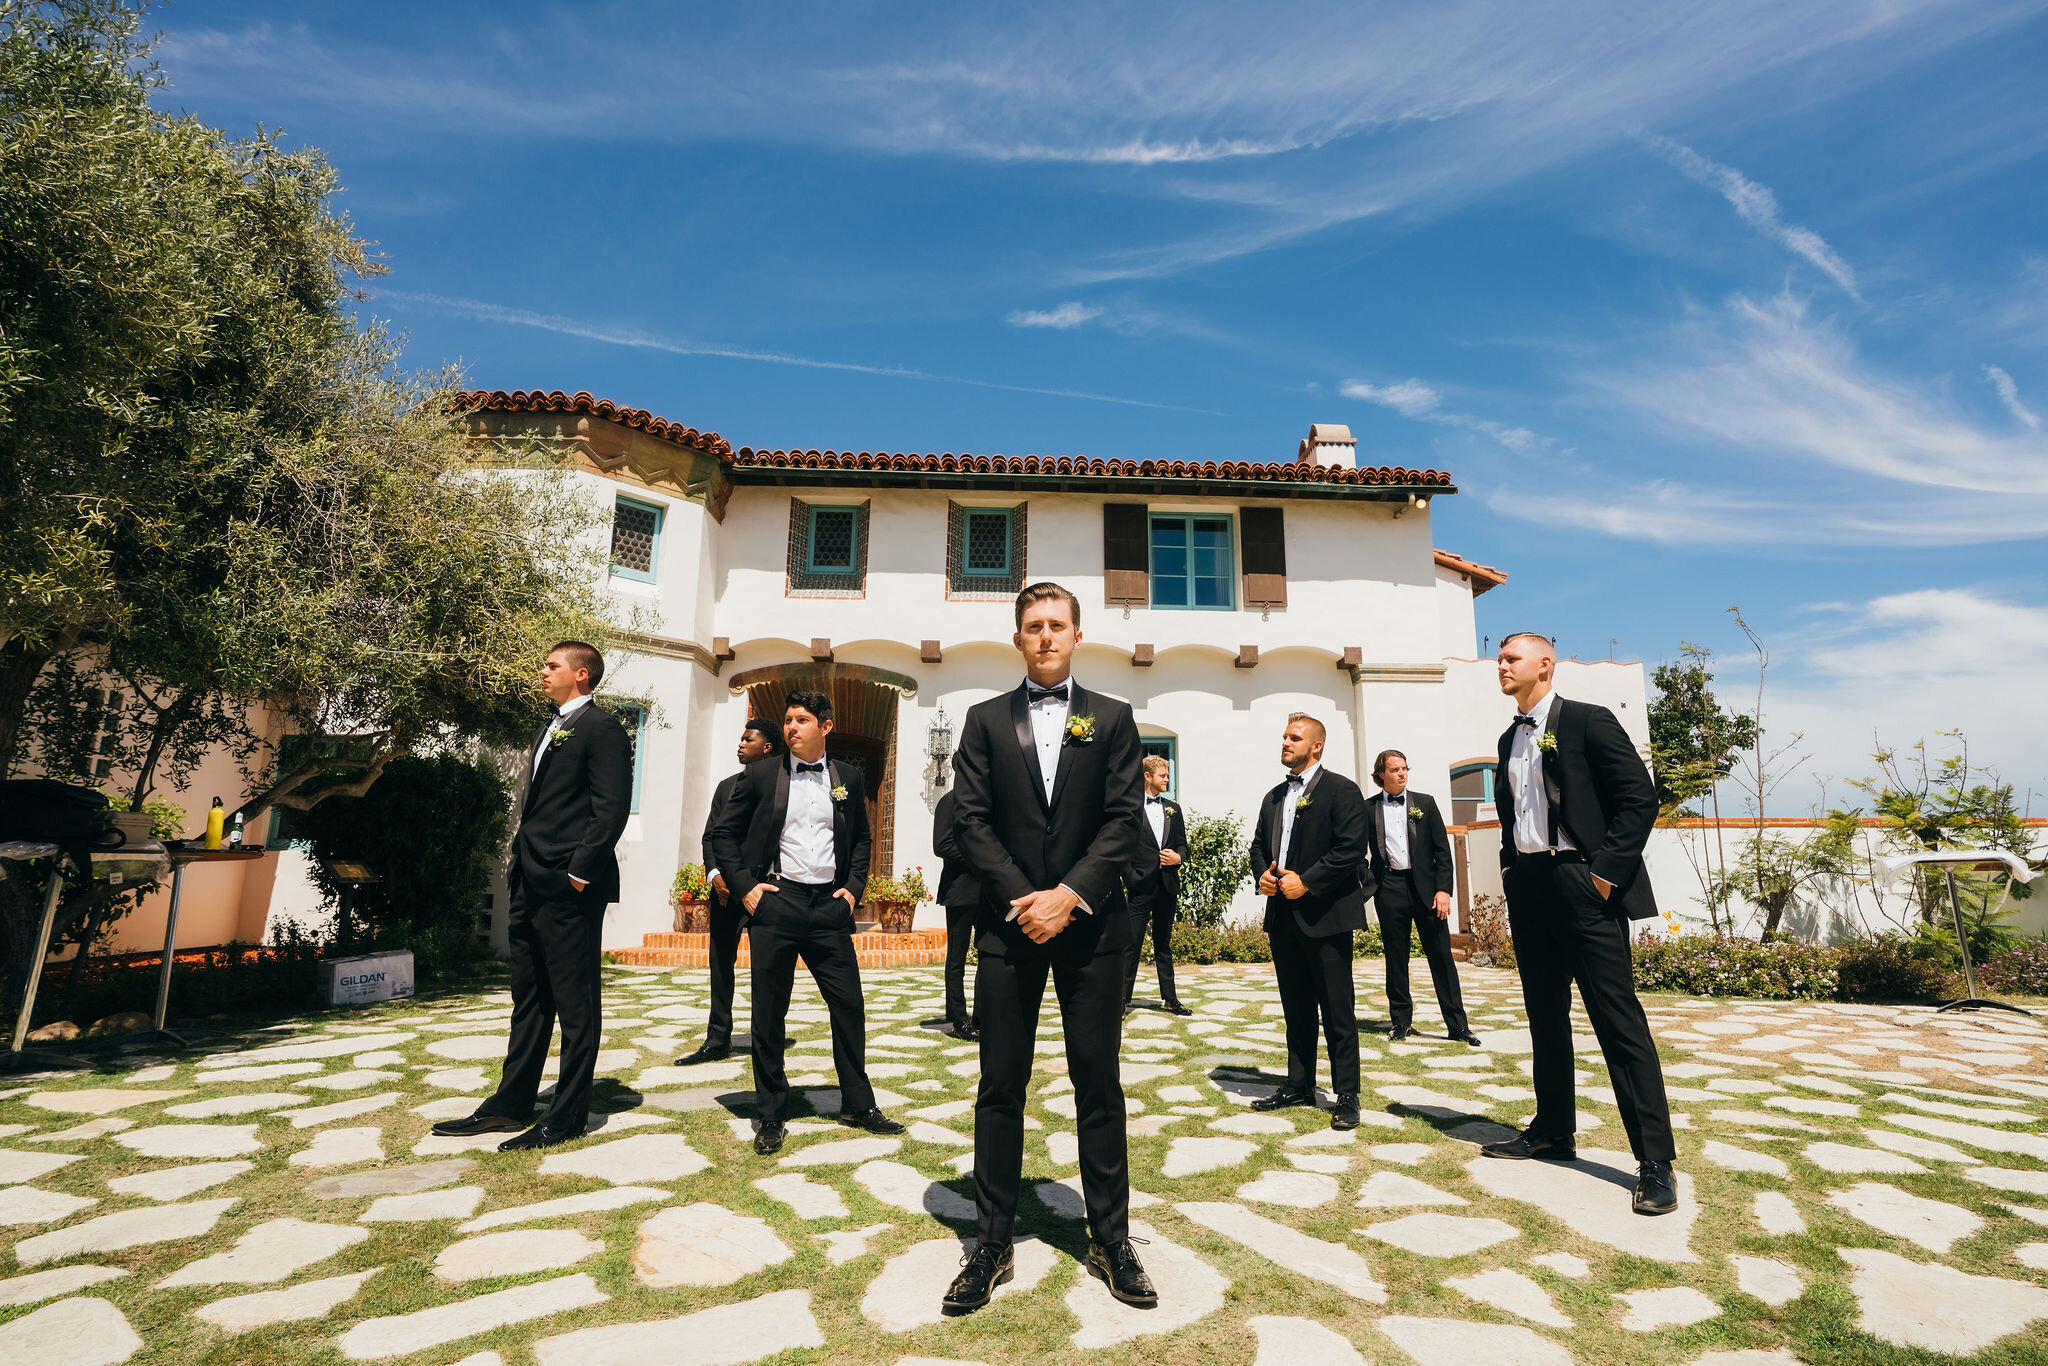 adamson-house-wedding-photography-053.jpg